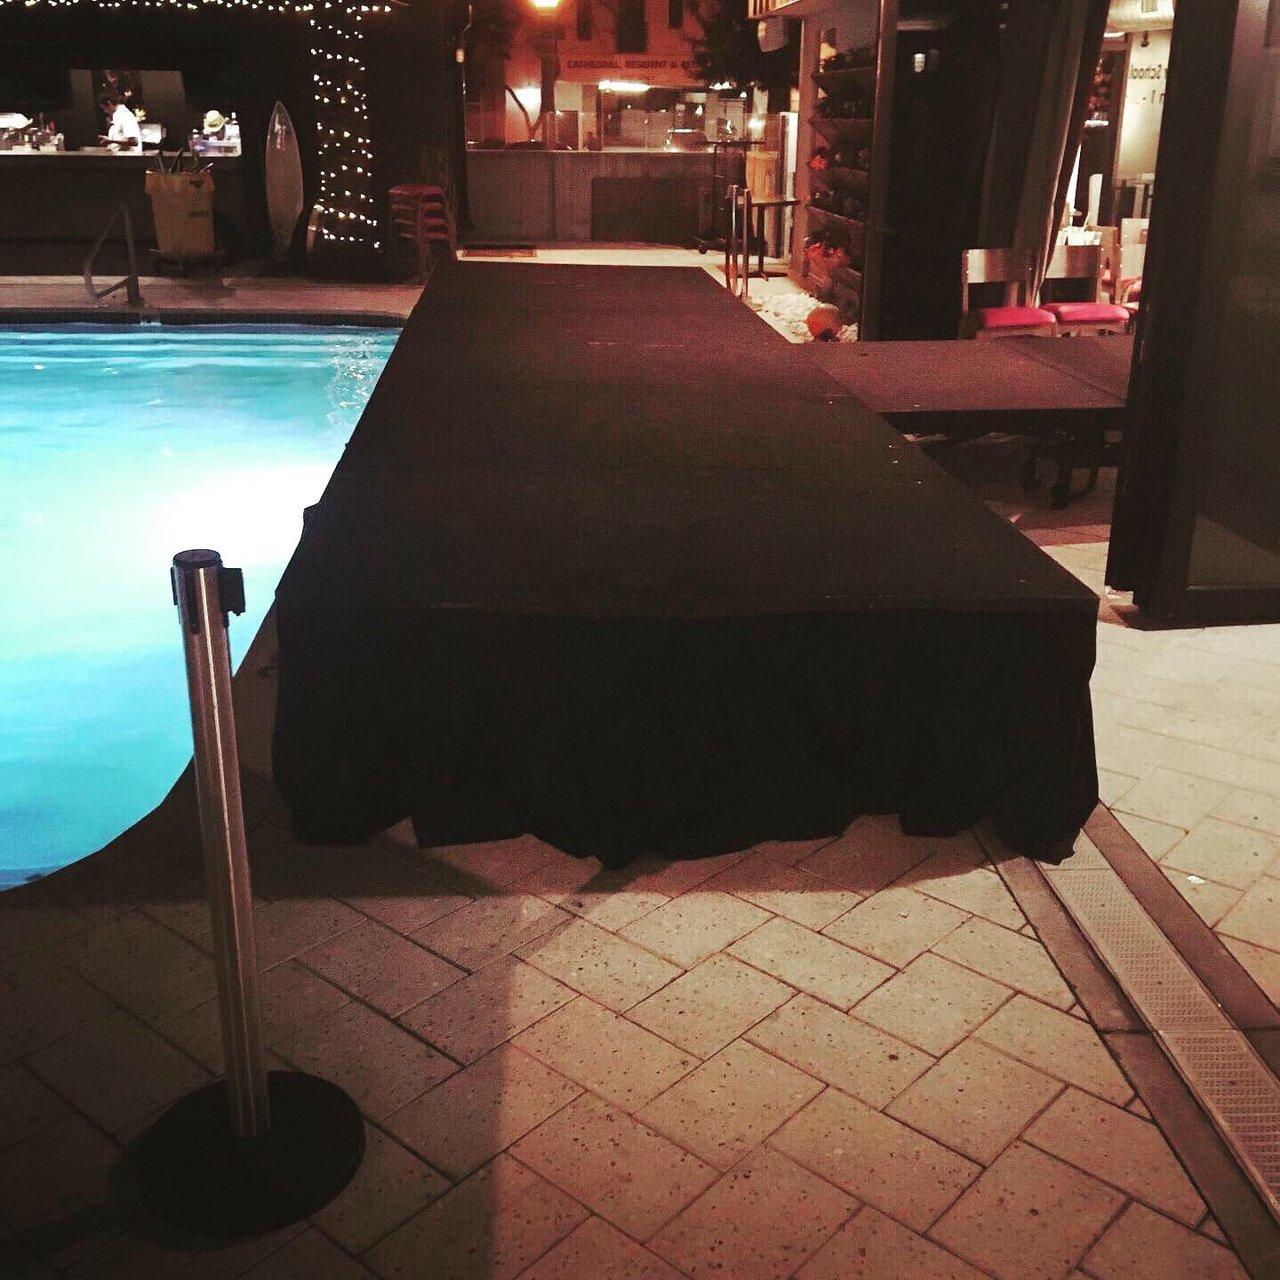 Fashion show @ Found RE Phoenix Hotel photo 79727B49-F7B4-4031-9833-185362B95BE8.jpg